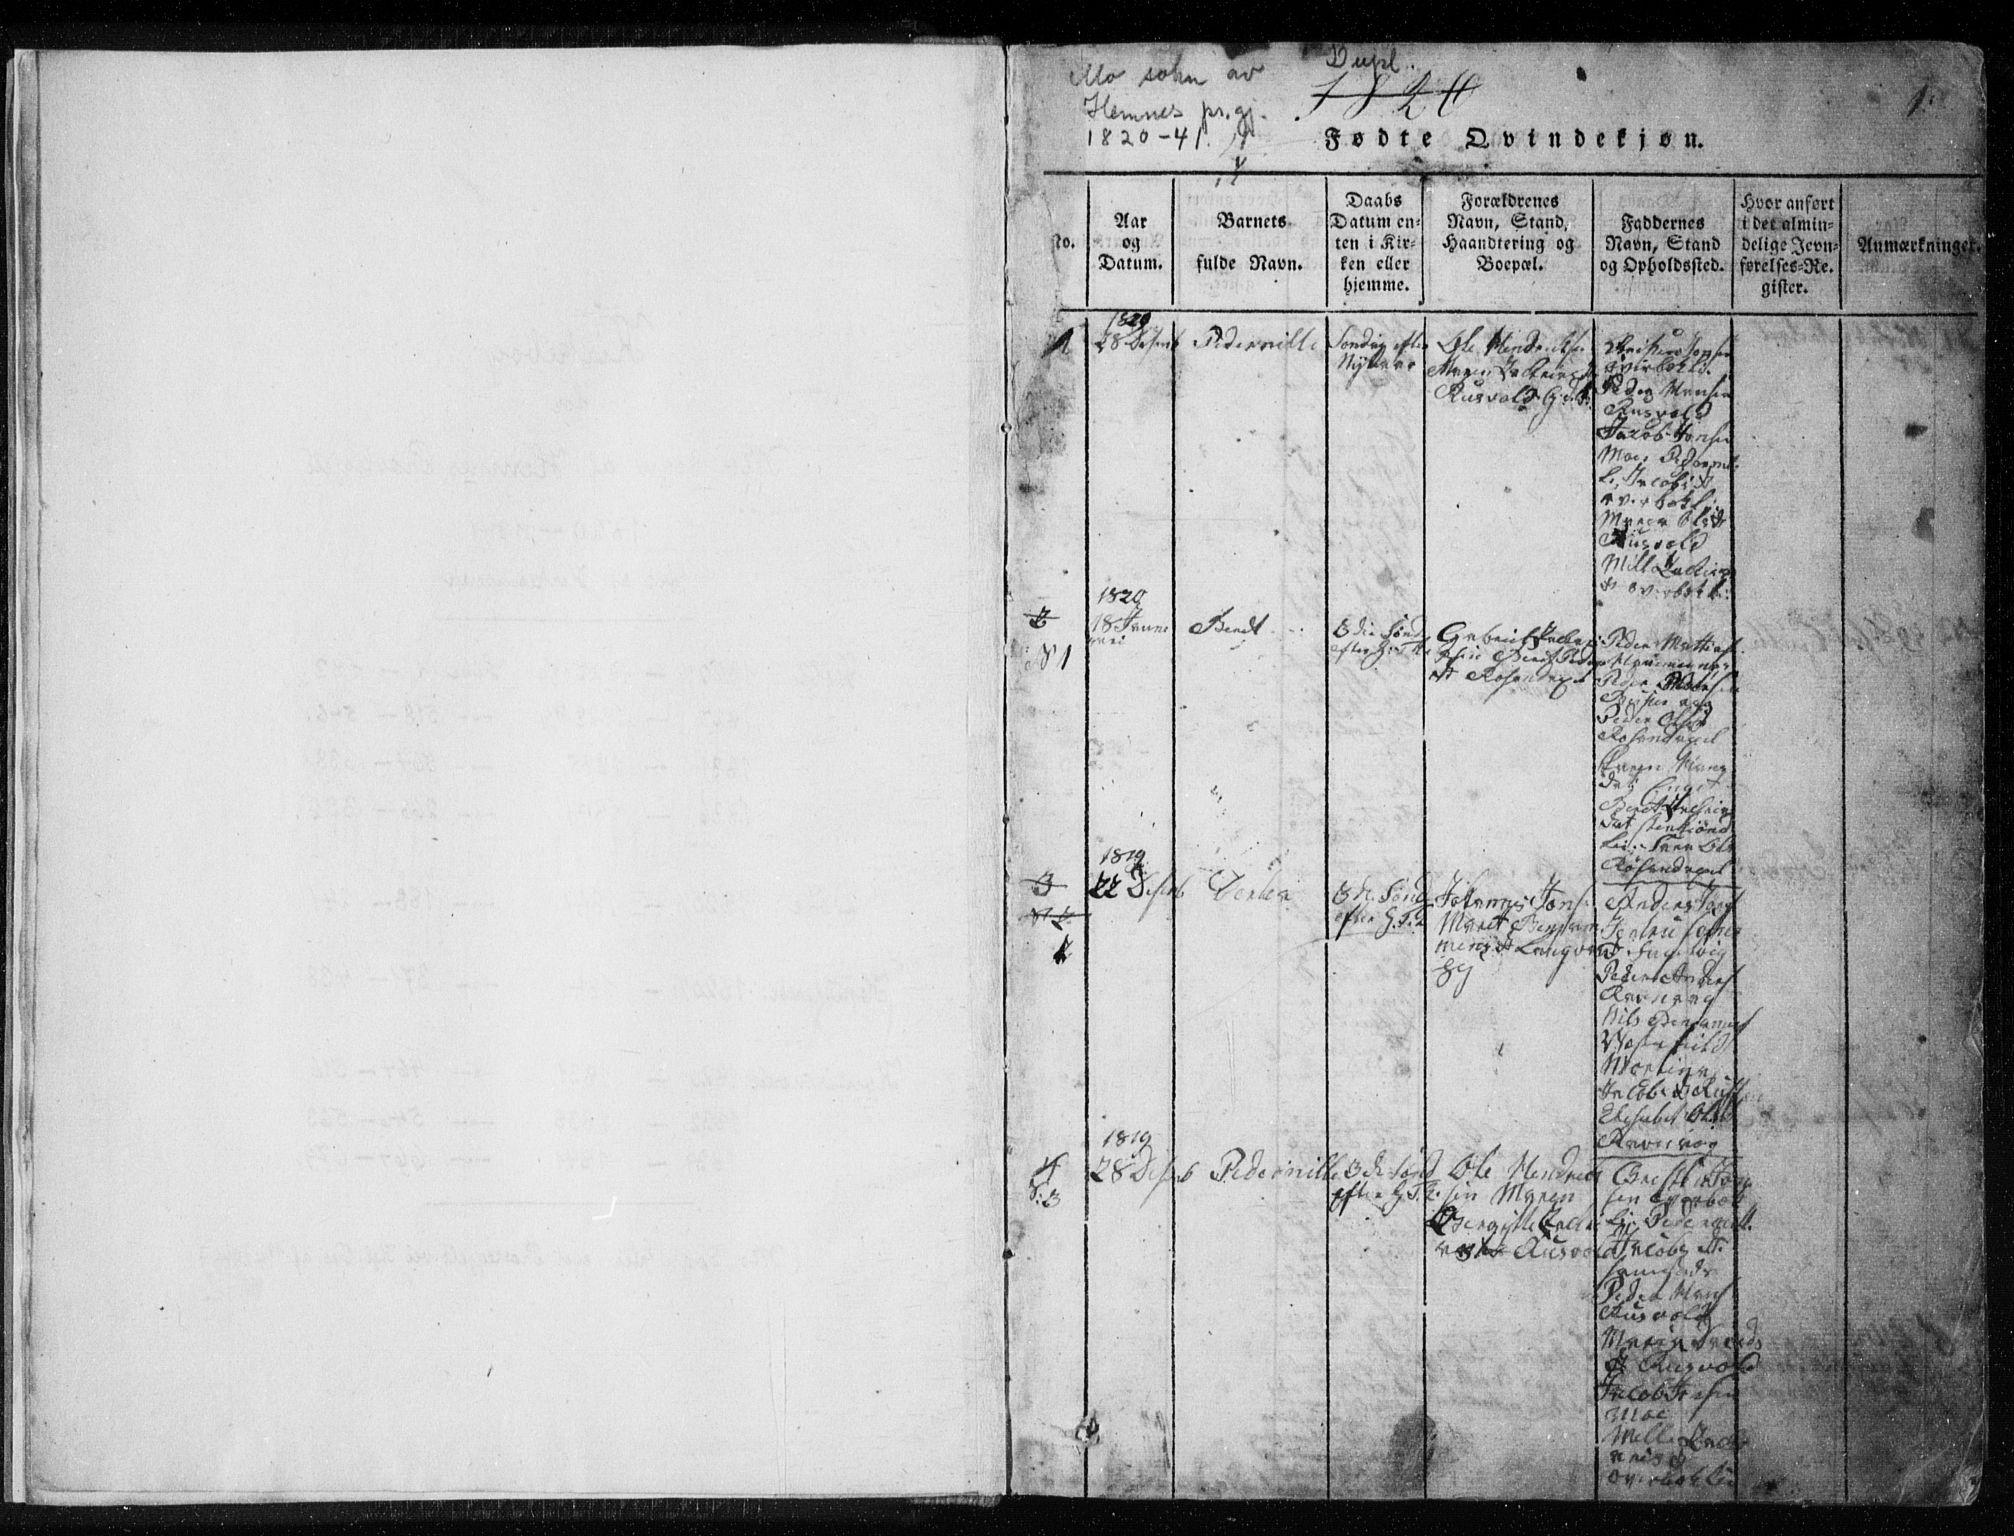 SAT, Ministerialprotokoller, klokkerbøker og fødselsregistre - Nordland, 827/L0412: Klokkerbok nr. 827C01, 1820-1841, s. 0-1